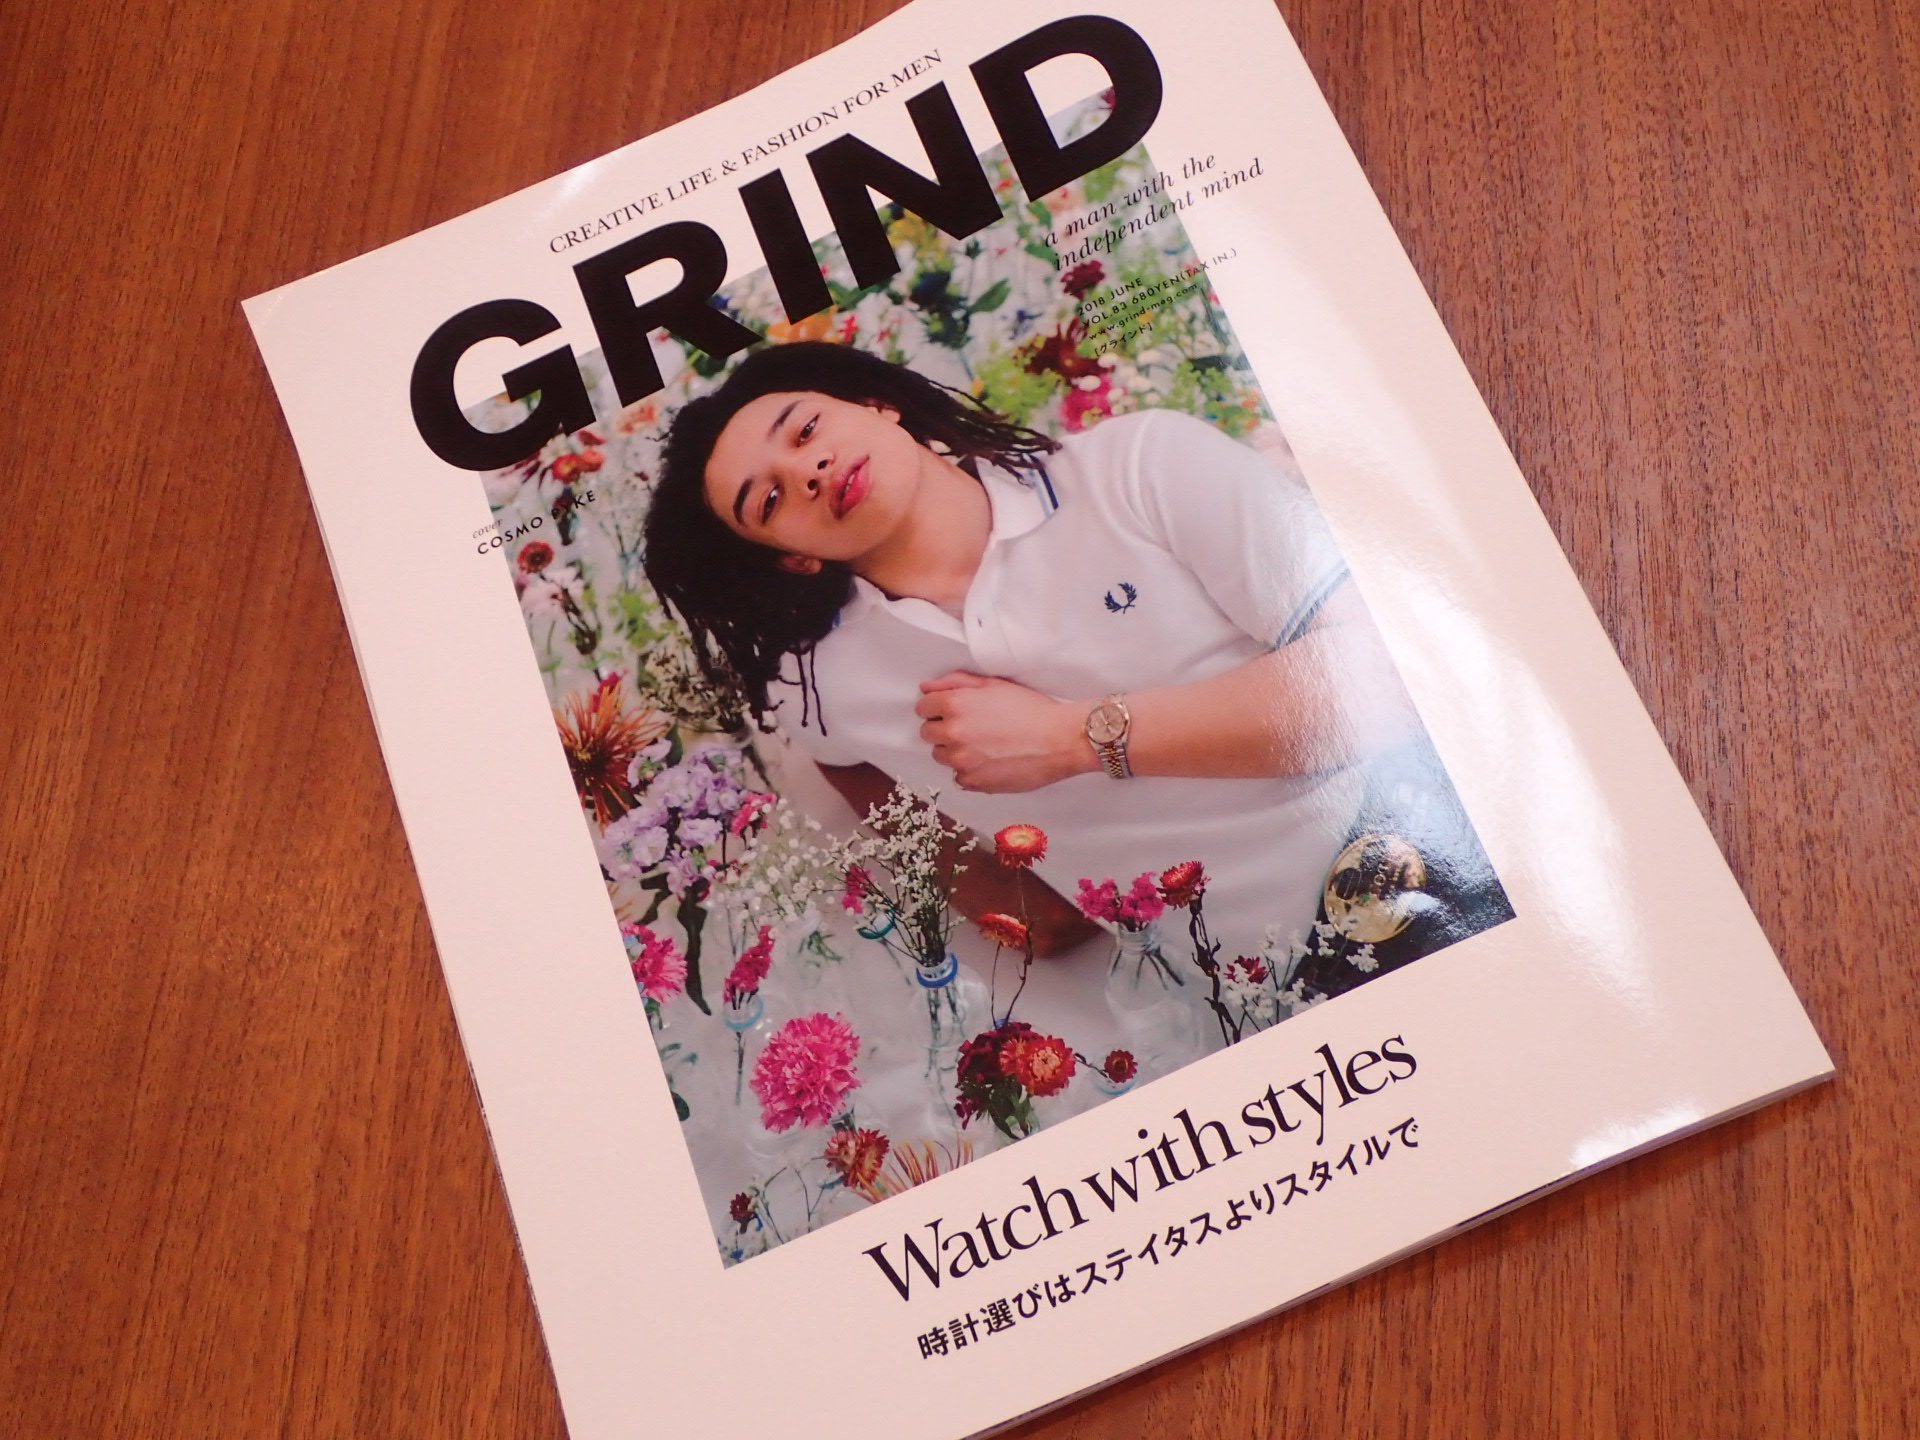 「GRIND(グラインド)」Vol.83 発売